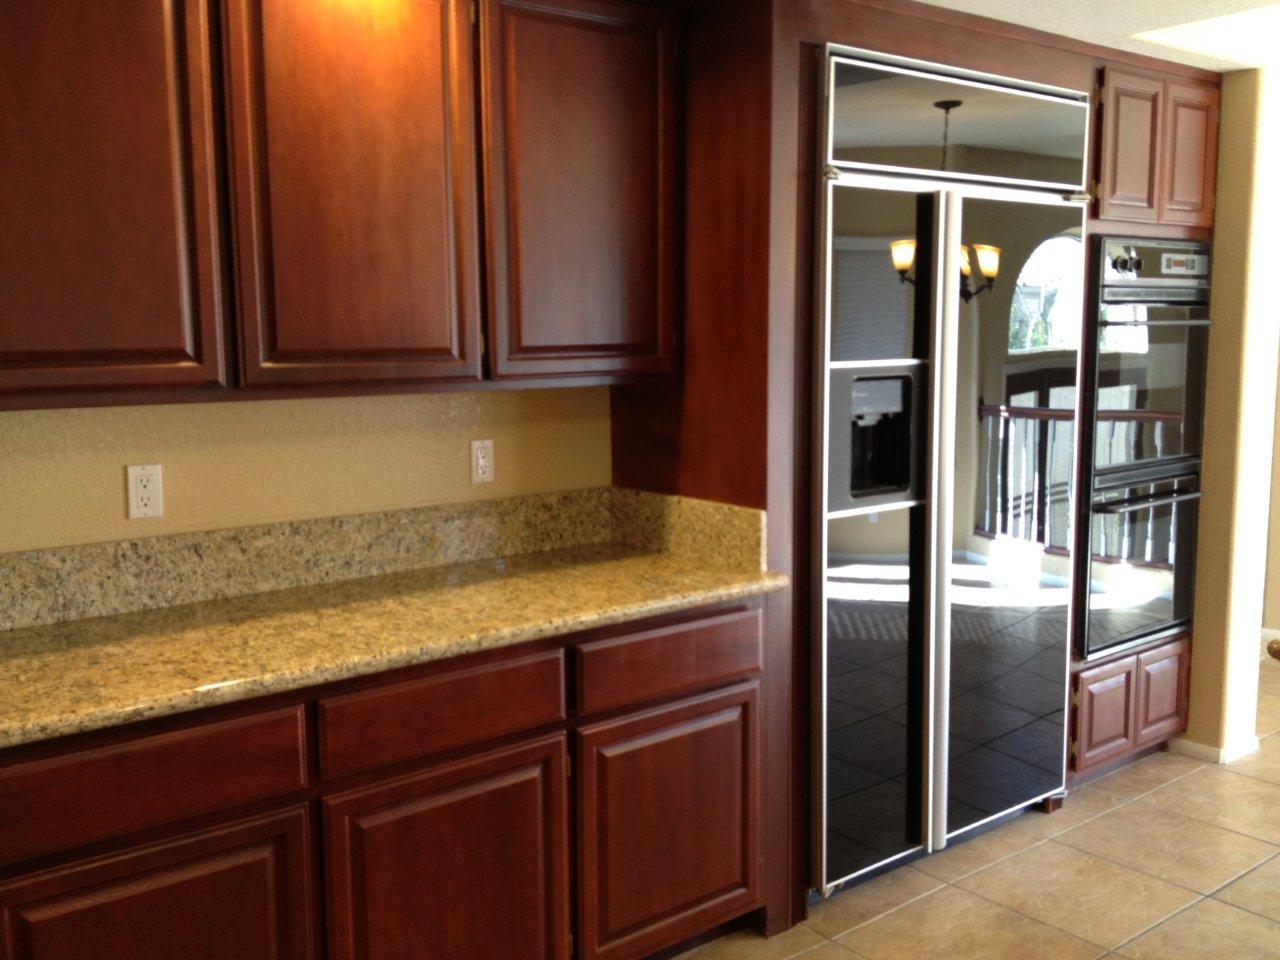 KITCHEN AND BATHROOM DESIGNS: Countertops Backsplash ... on Kitchen Counter Top Decor  id=58284